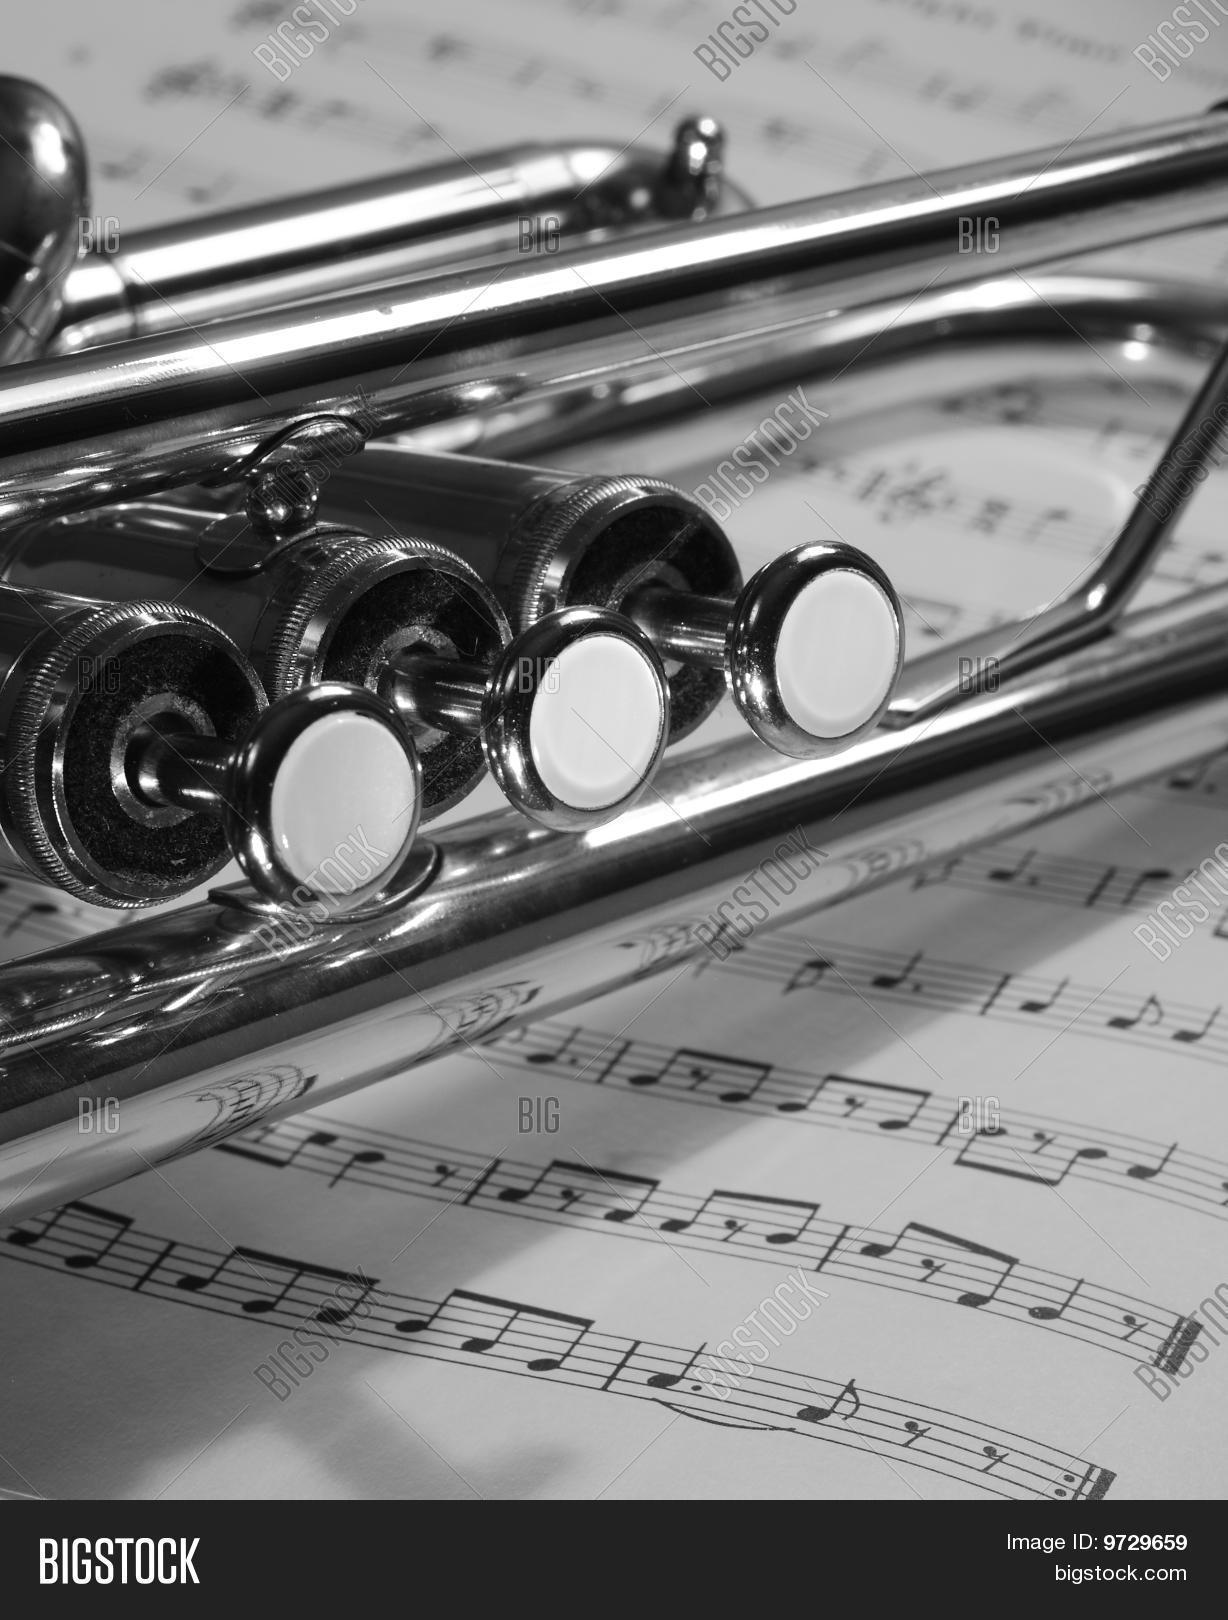 Trumpet Image & Photo (Free Trial) | Bigstock